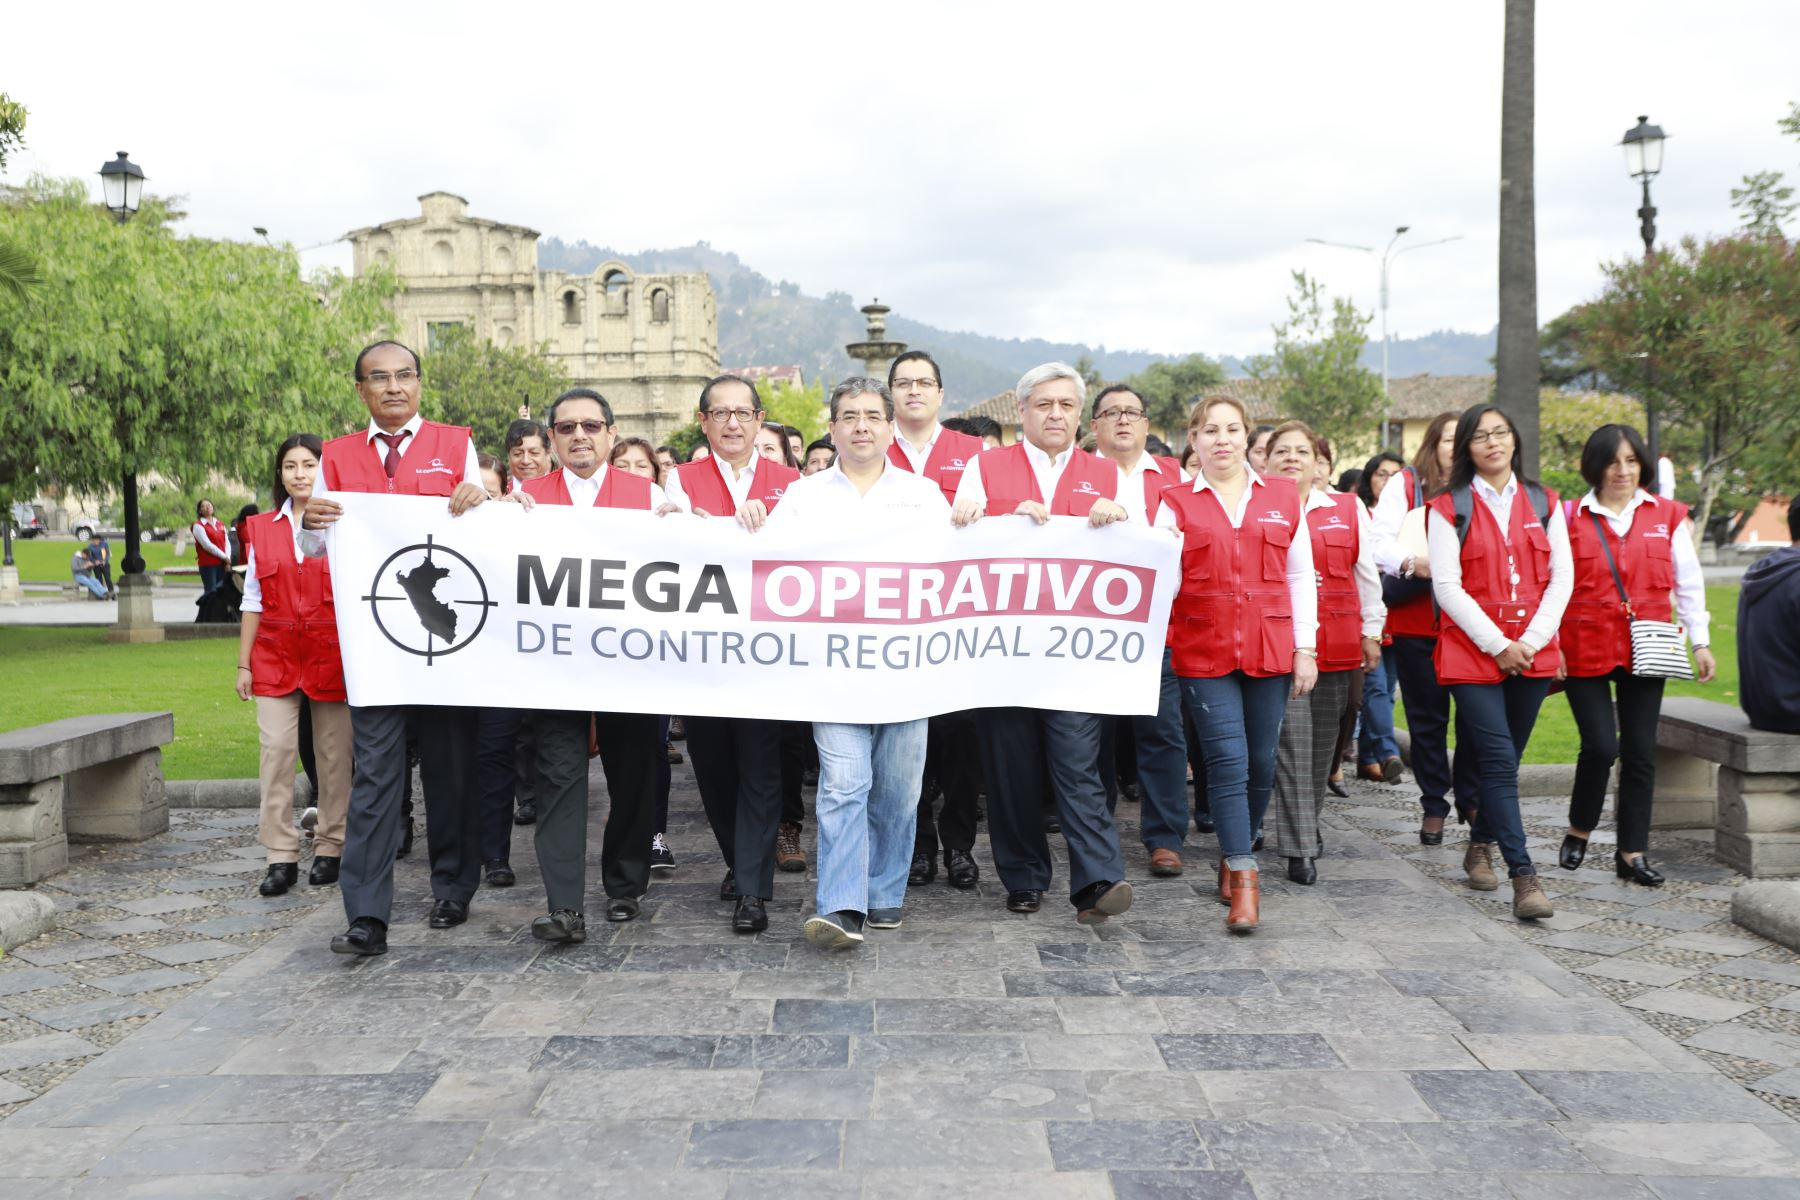 El contralor general, Nelson Shack, encabezó el primer megaoperativo de control regional en Cajamarca. Foto: ANDINA/Difusión